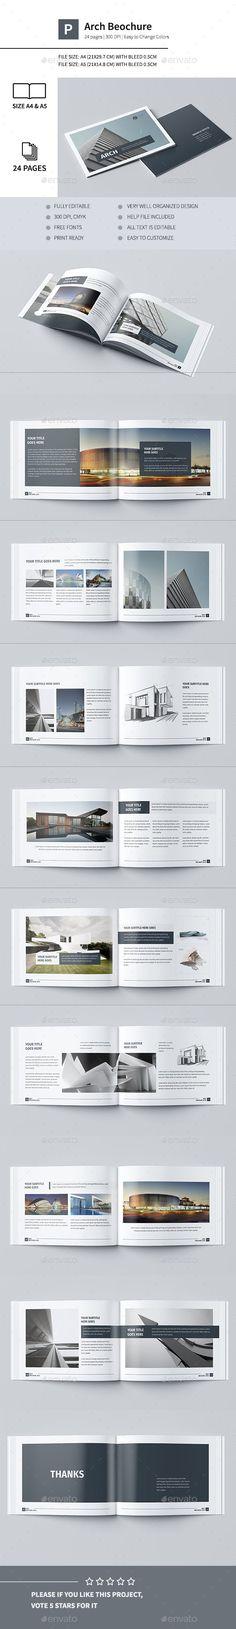 Modern Architecture Brochure 24 Pages & — InDesign INDD - Graphic Templates Search Engine Web Design, Layout Design, Portfolio Design, Beau Cv, Architecture Design, Resume Architecture, Architecture Panel, Booklet Design, Grafik Design